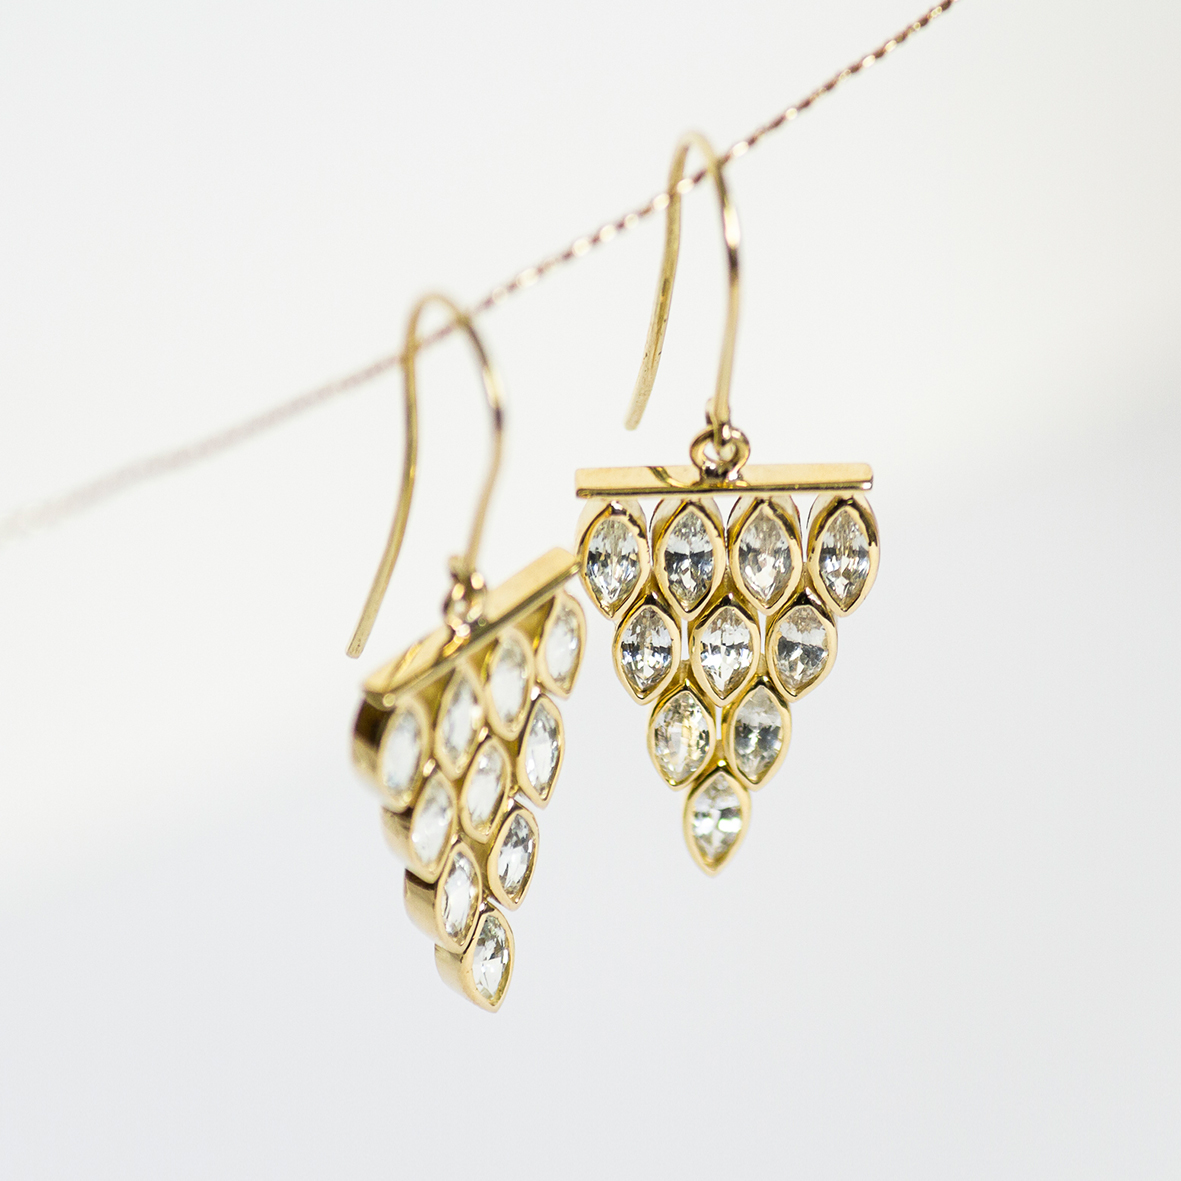 2. OONA_philo_ficha2_cascade marquise sapphire earrings